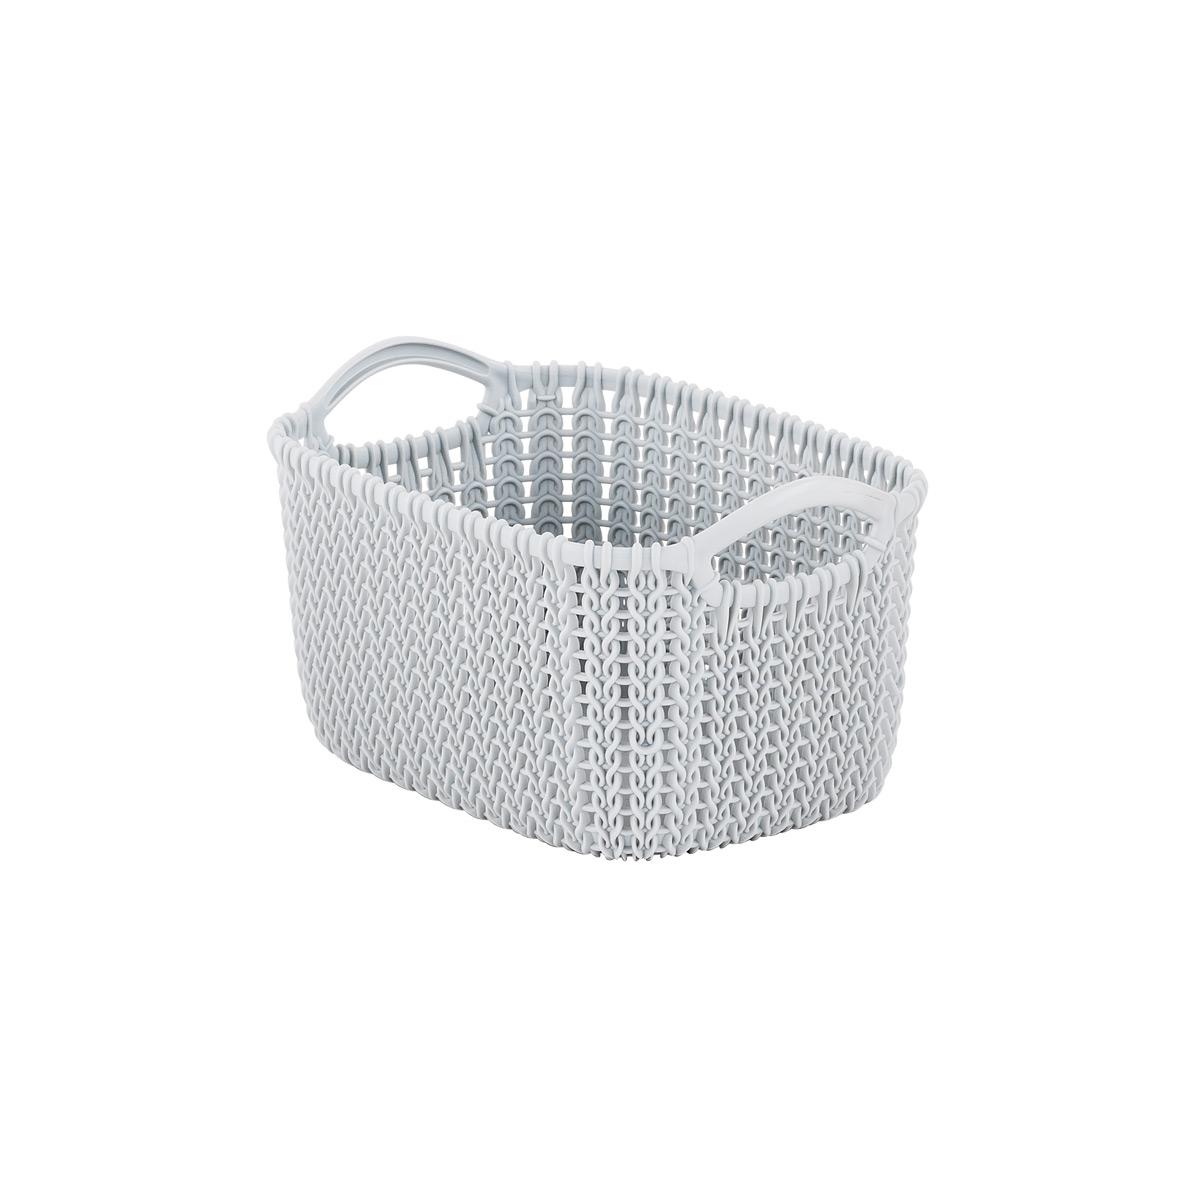 Knit Basket